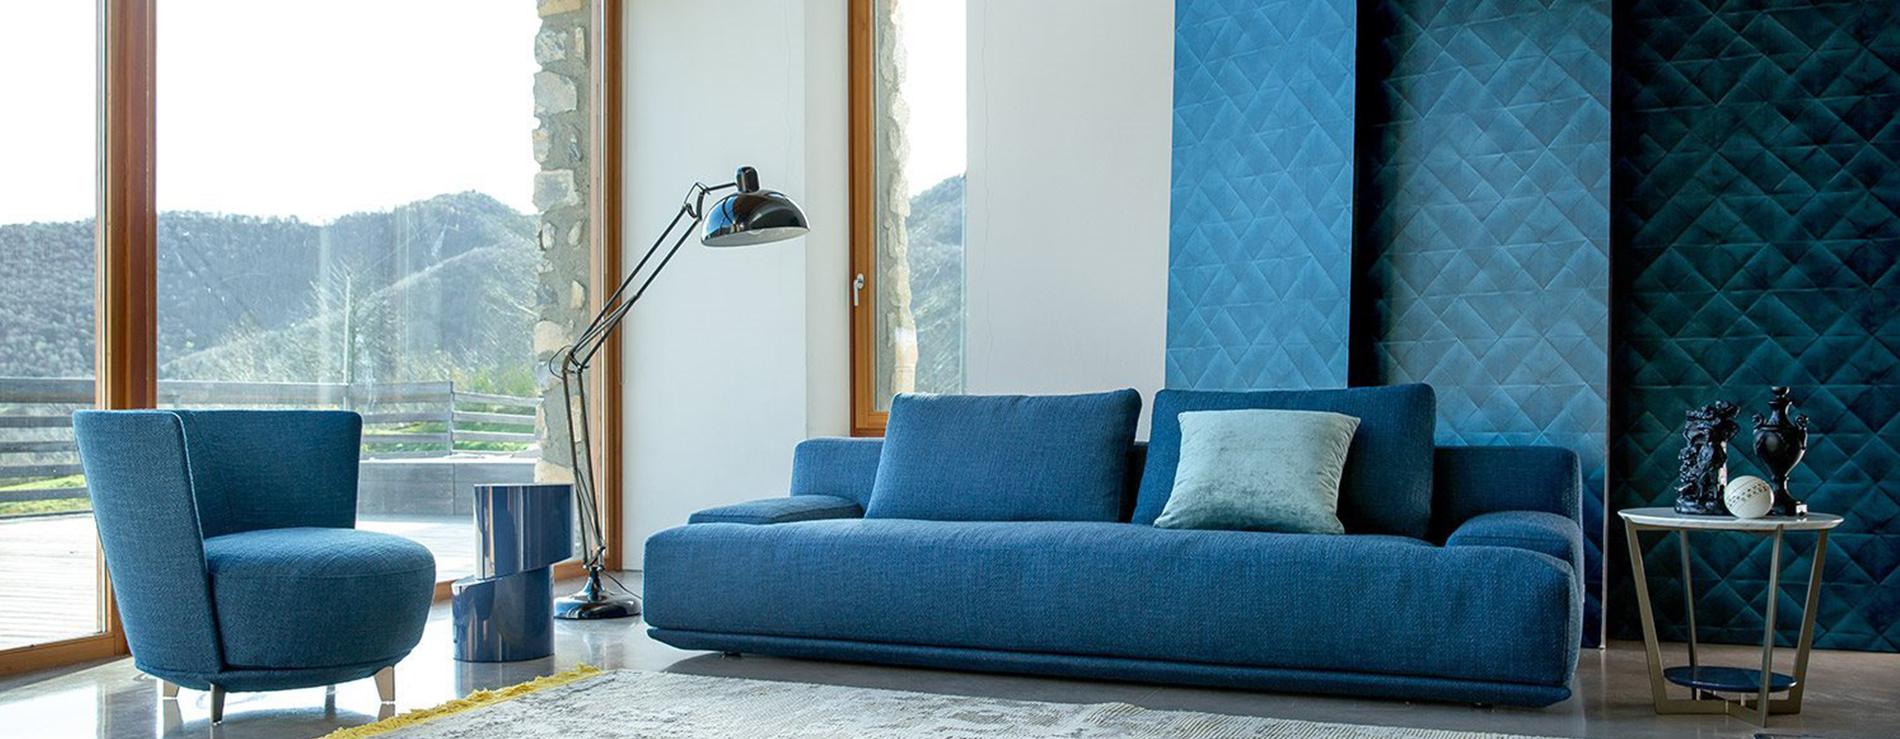 bruce-divano